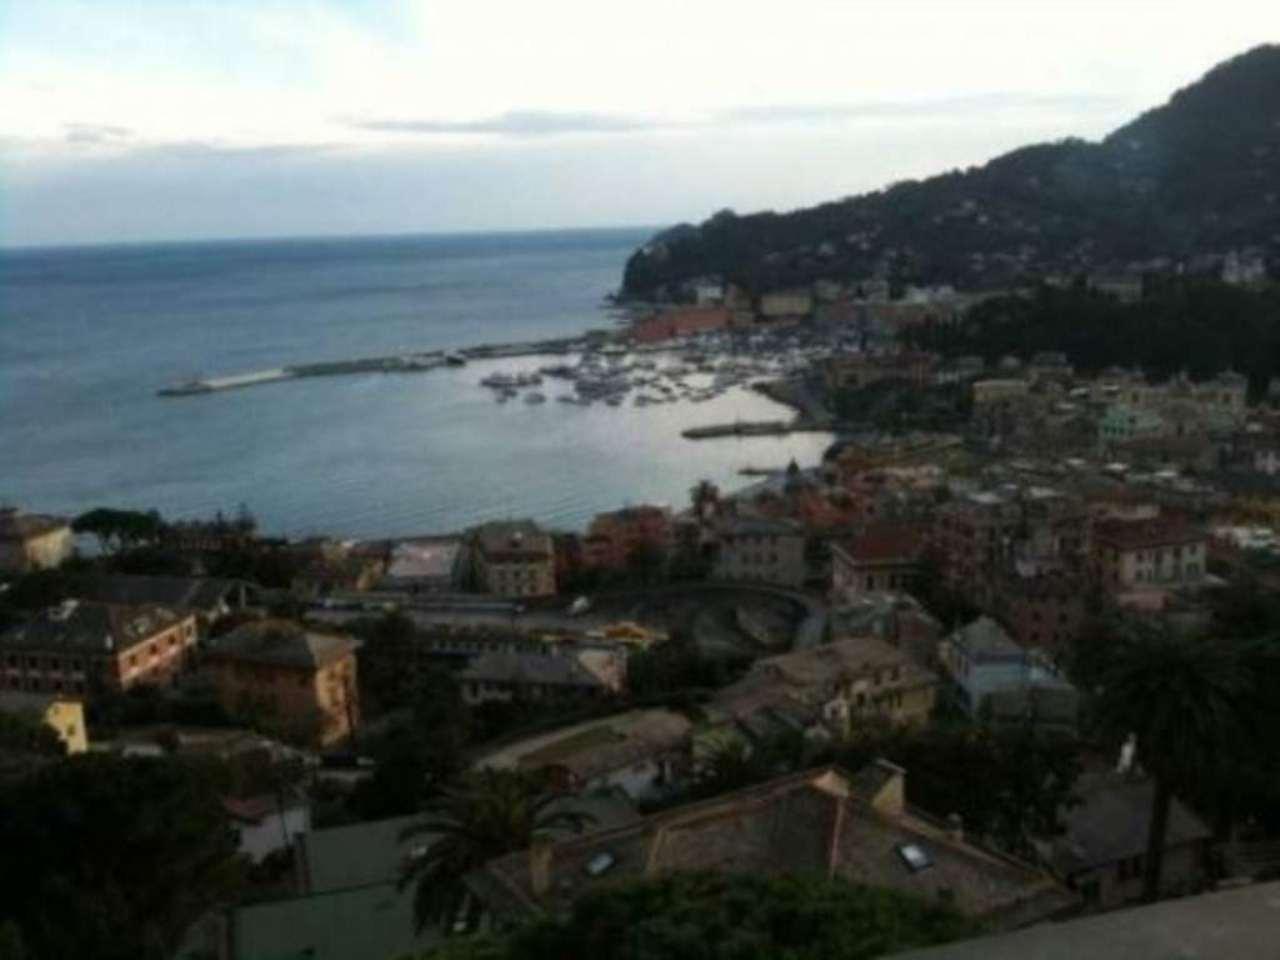 Santa Margherita Ligure Vendita VILLA Immagine 0